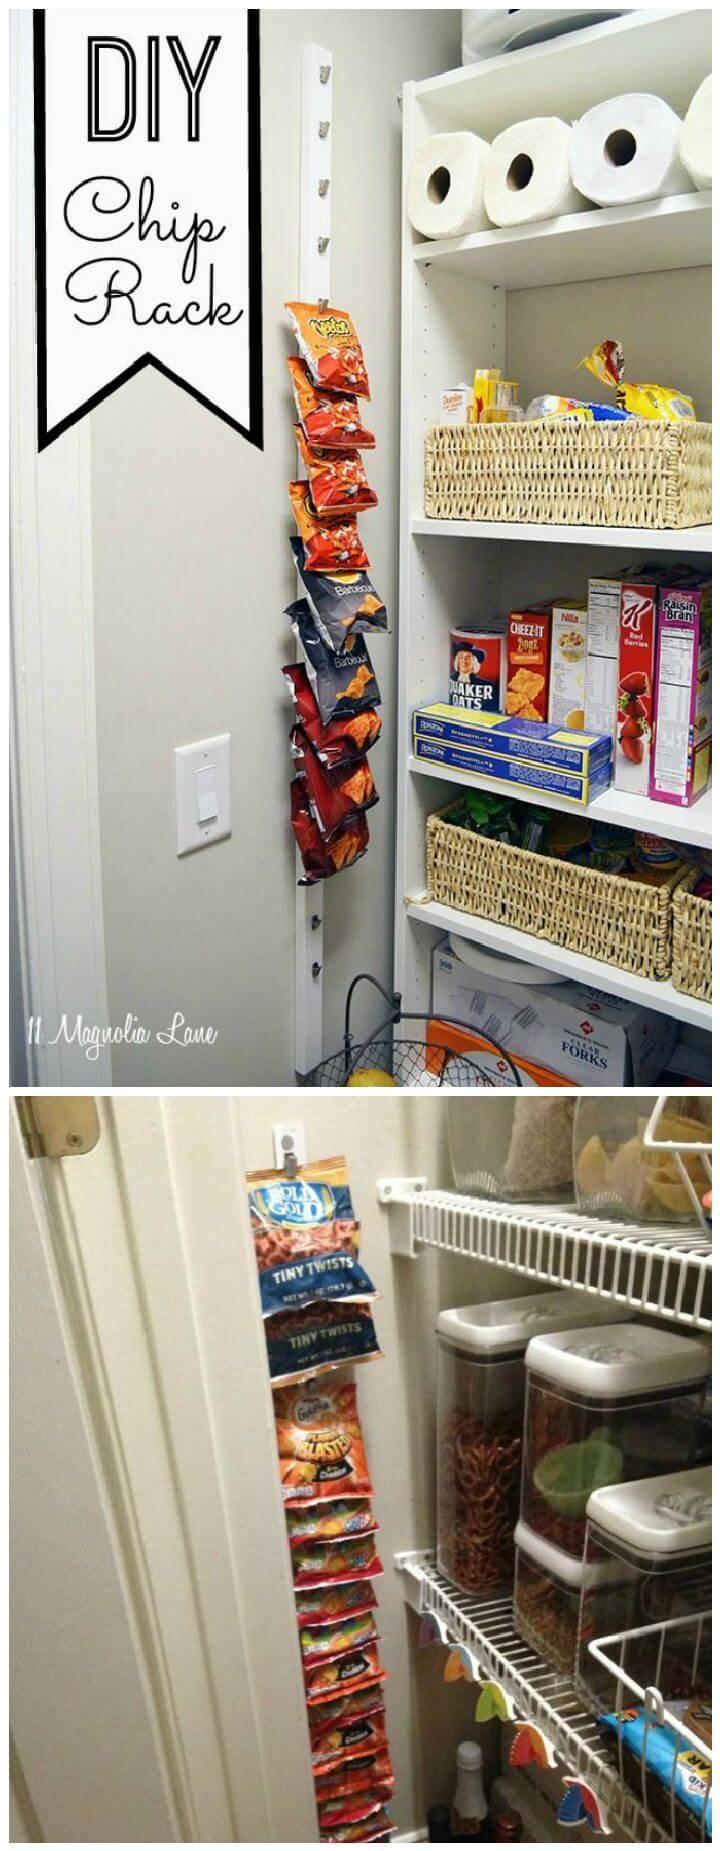 DIY Pantry Chip Rack